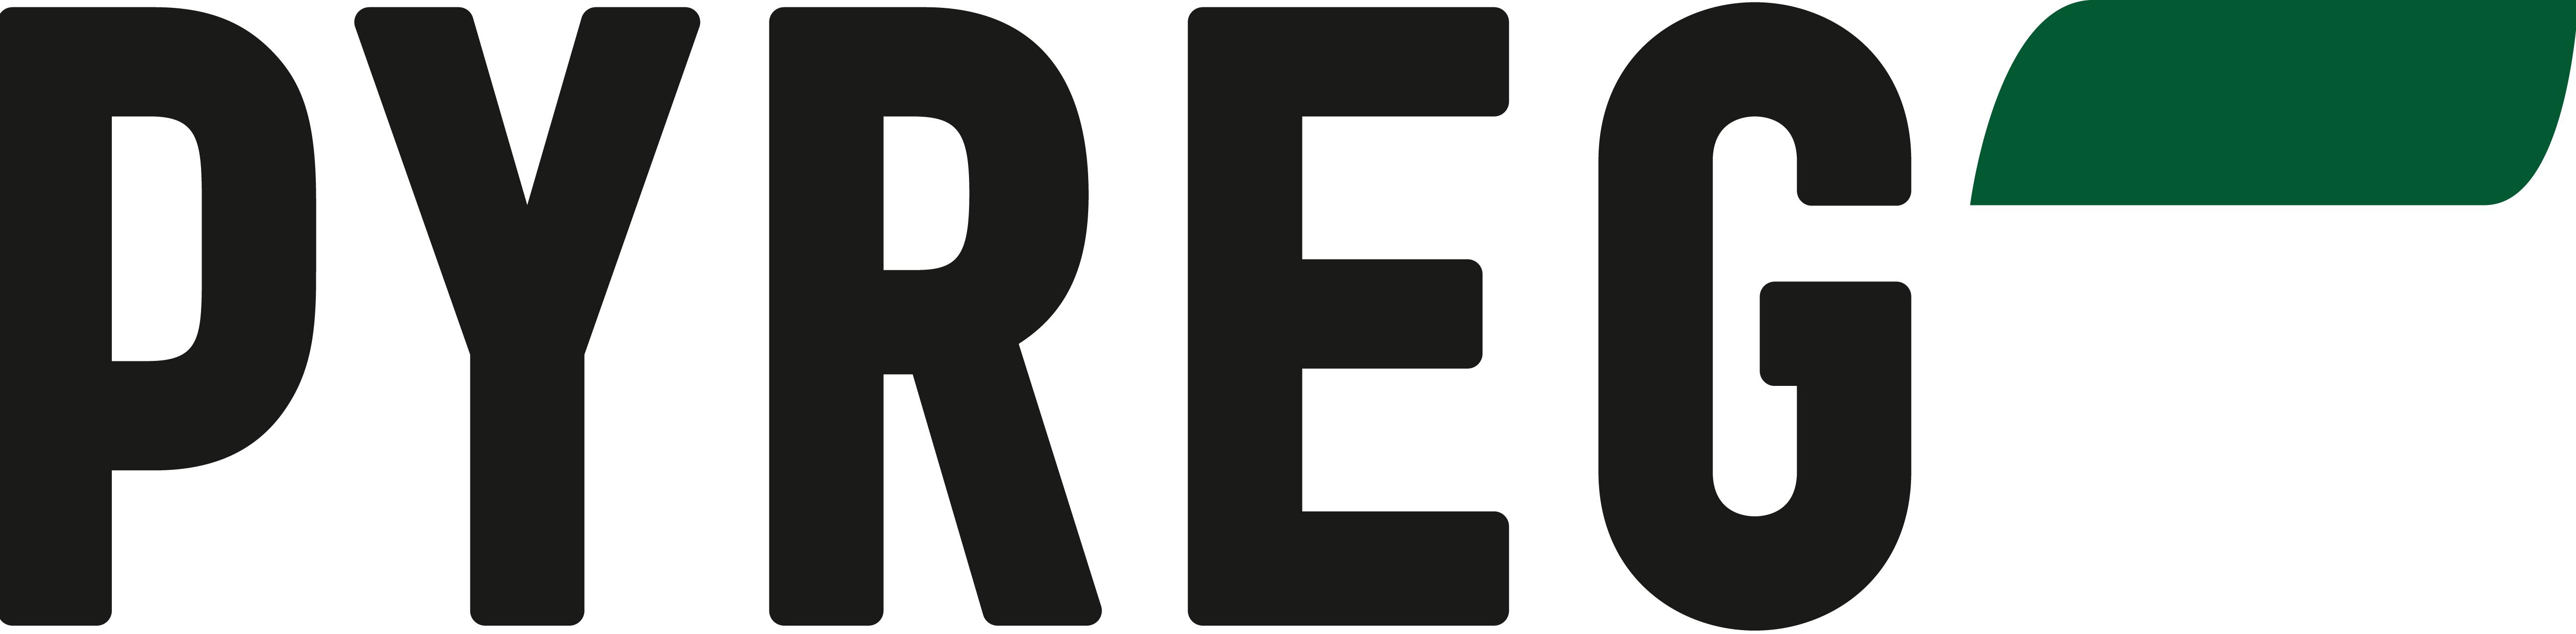 PYREG logo